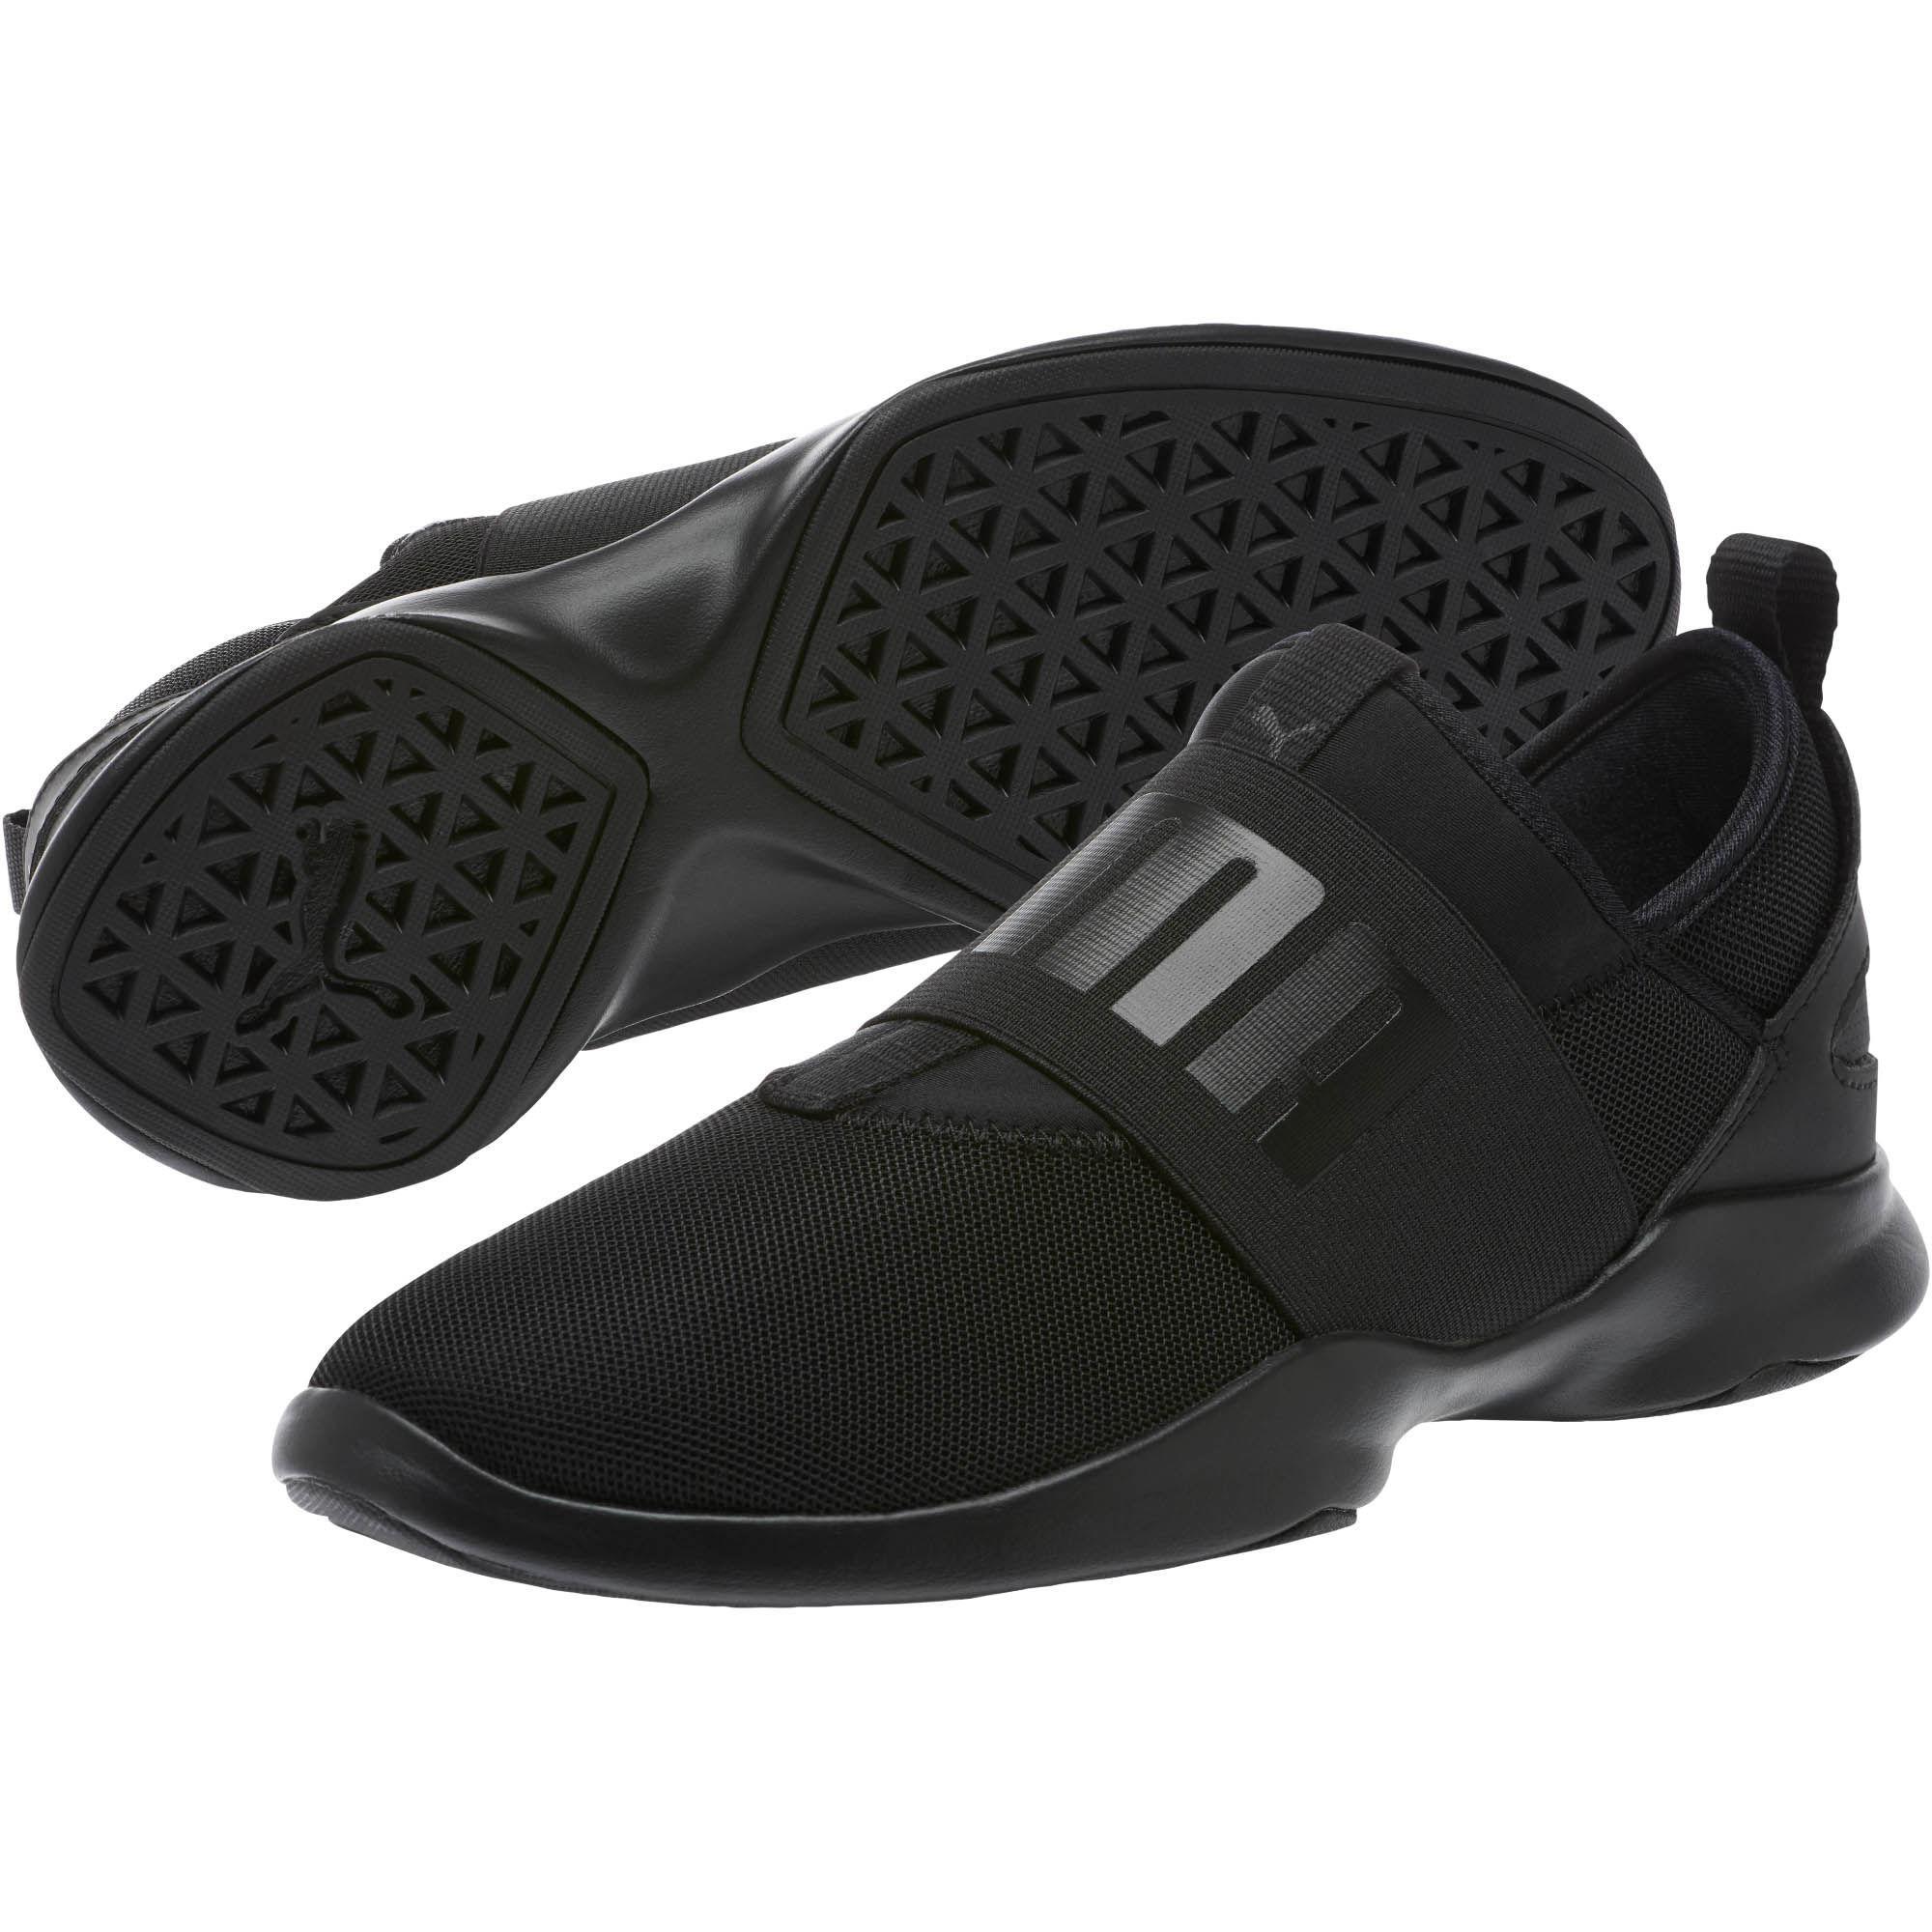 66cf3b15f027 Lyst - PUMA Dare Women s Slip-on Sneakers in Black